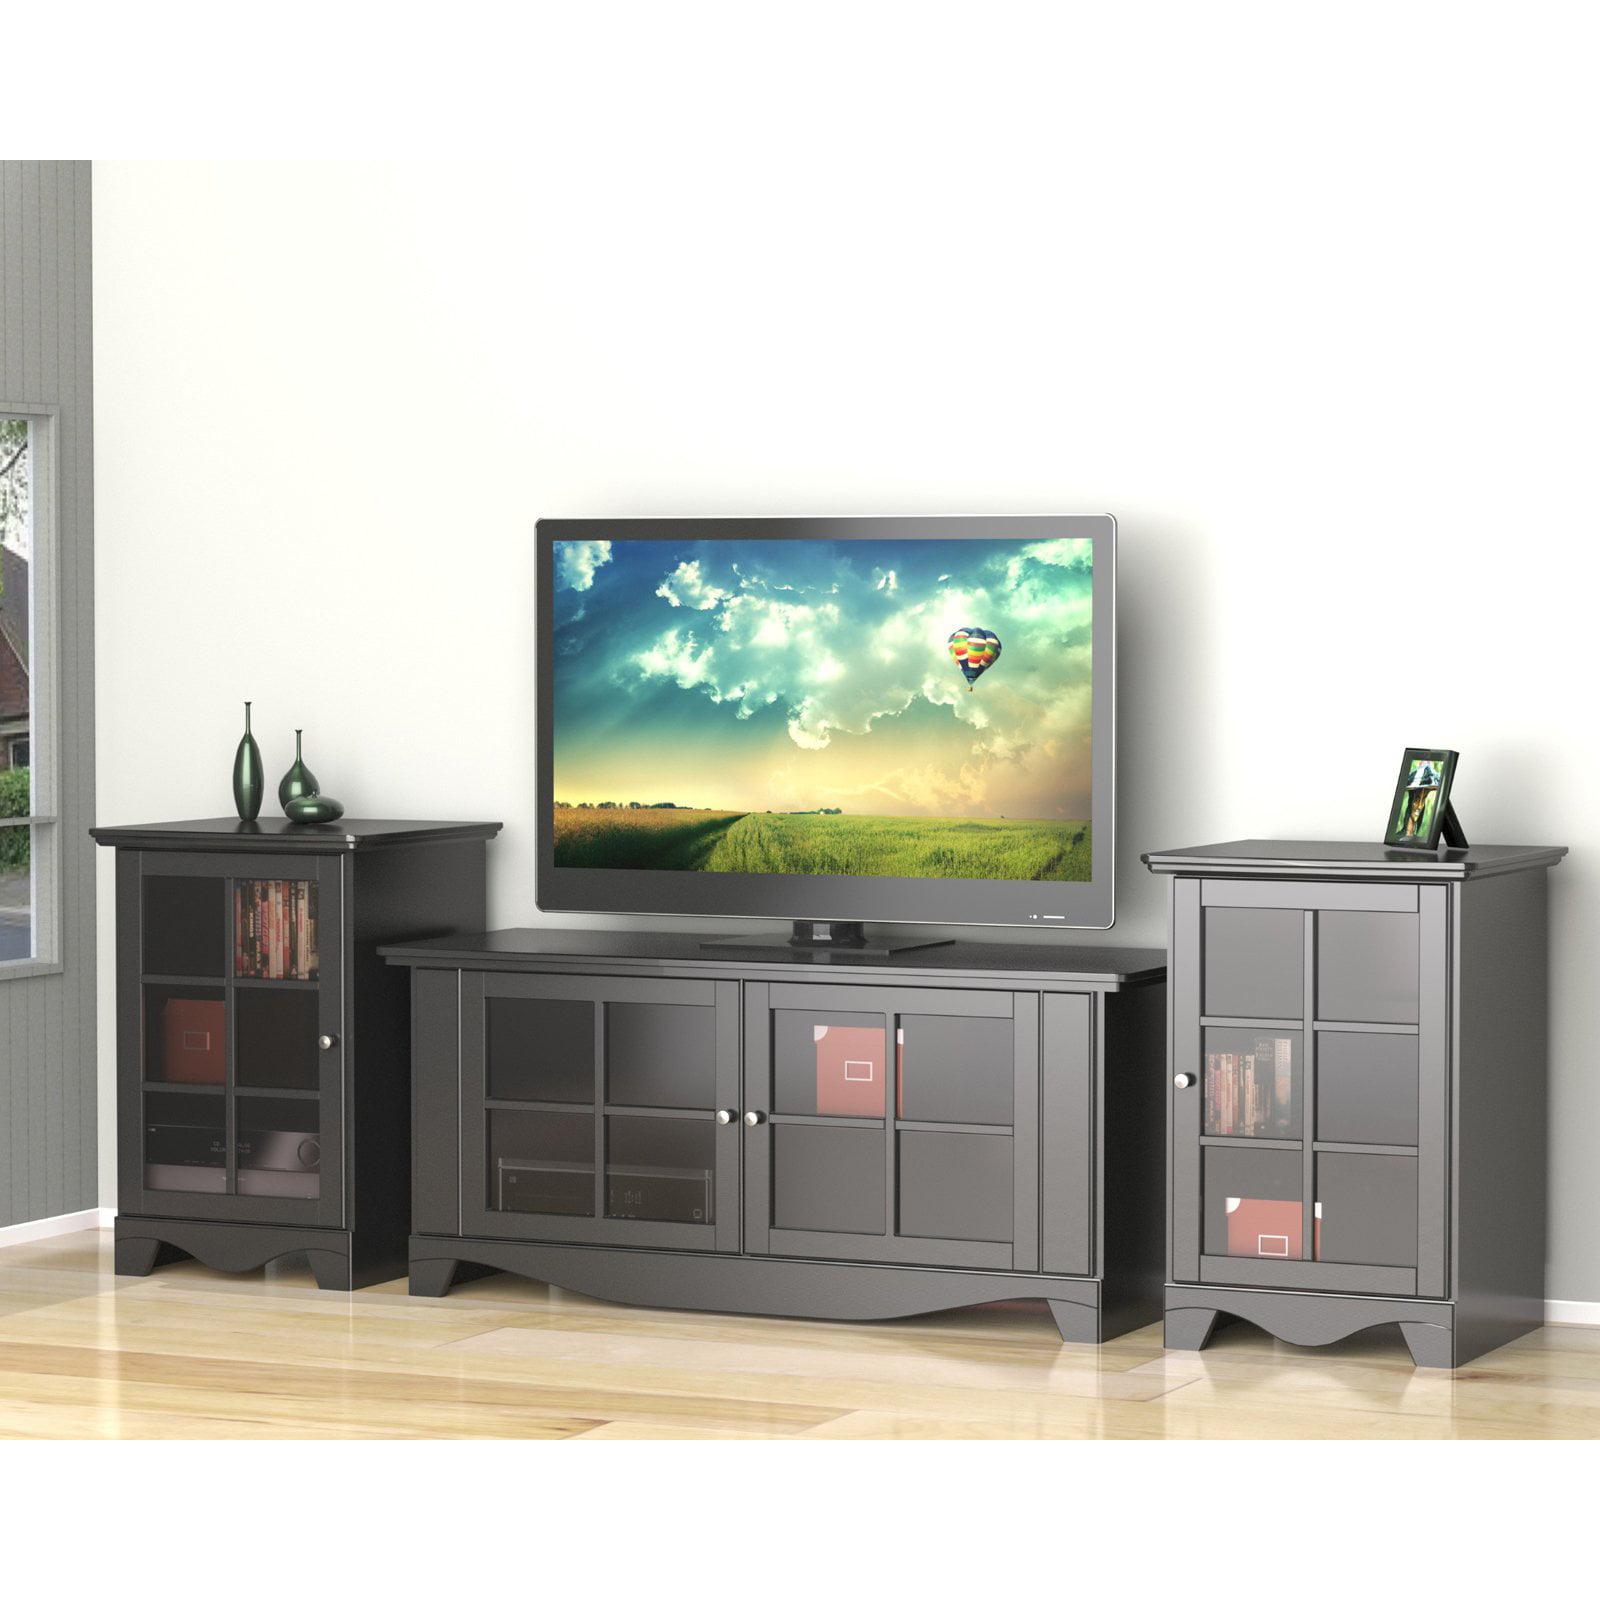 Pinnacle Tv Stand For Tvs Up To 60 Walmart Com Walmart Com